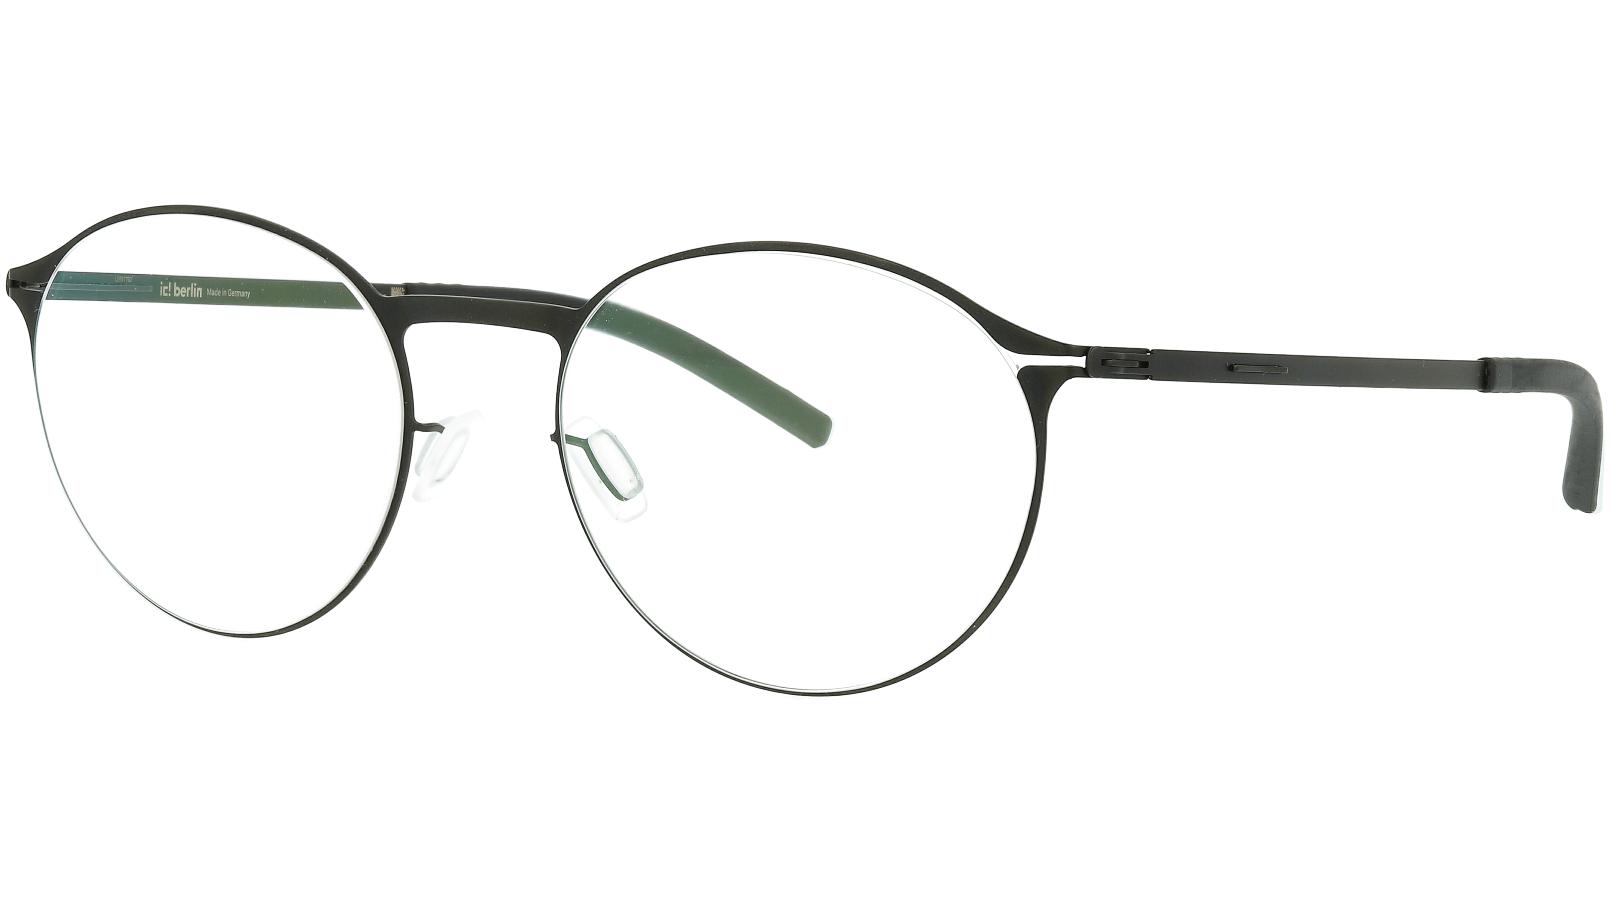 ic! Berlin Etesians 2.0 Black 49 Flex Glasses